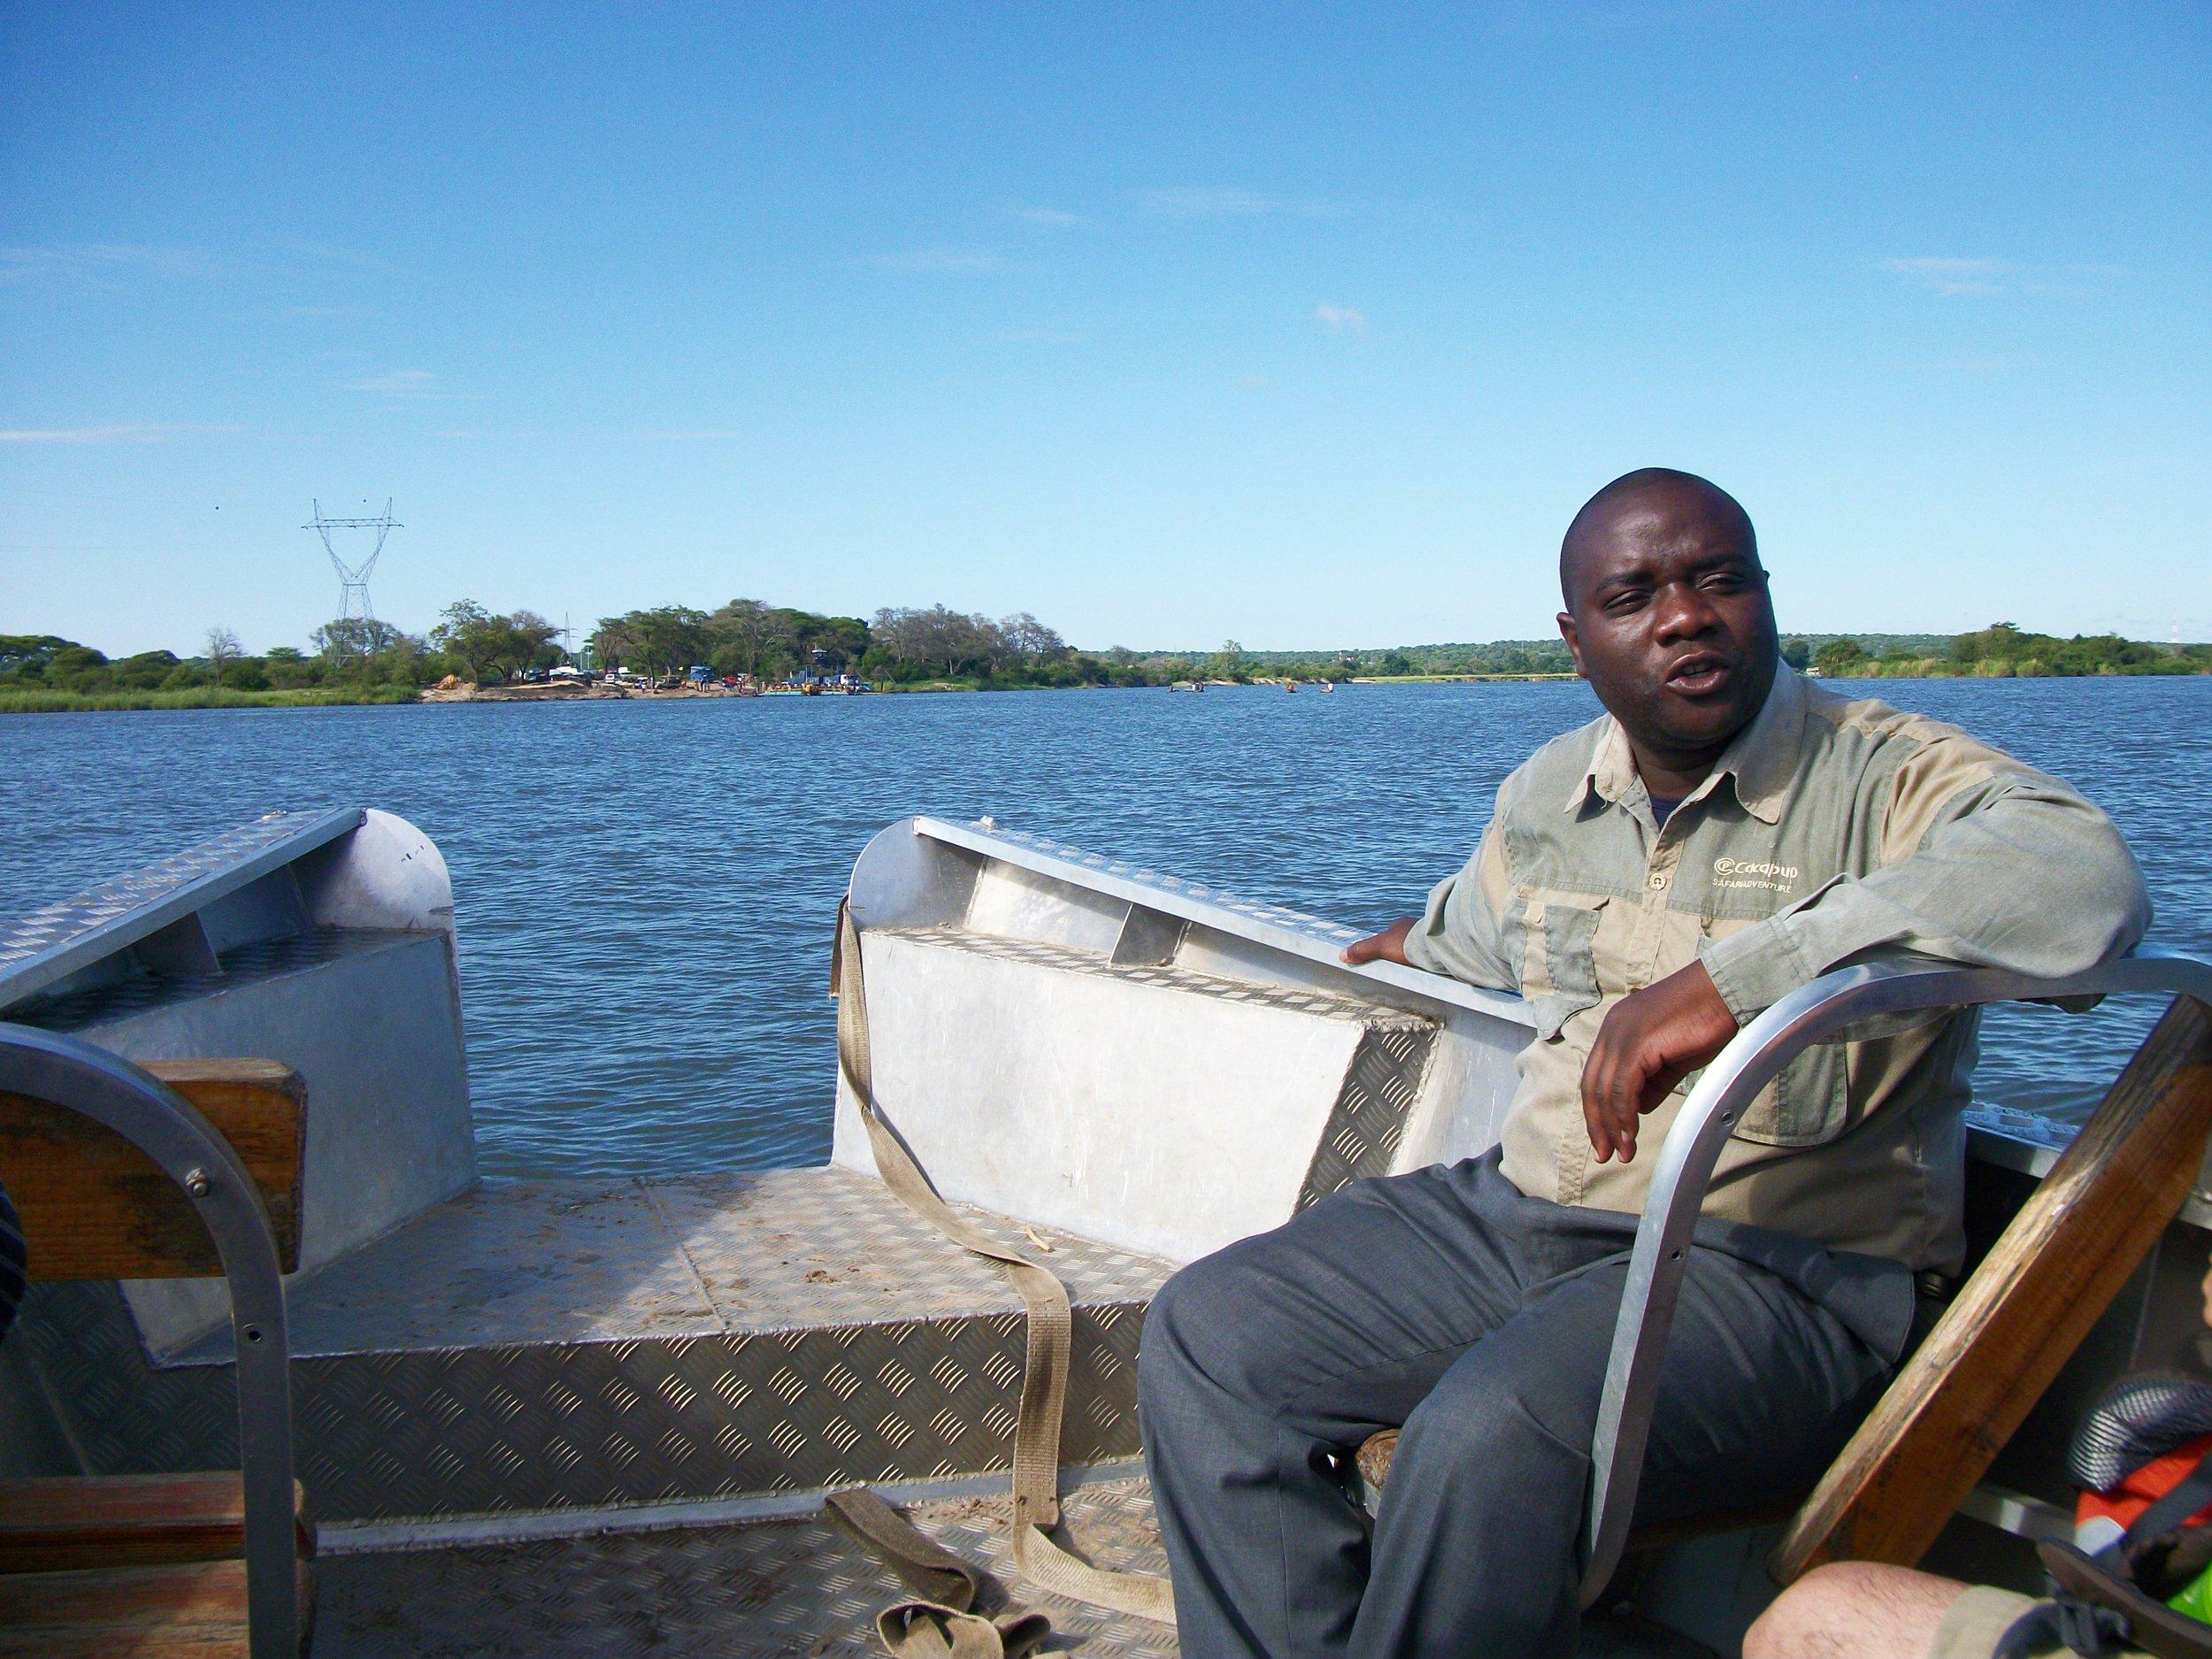 Our friendly Botswanian safari guide